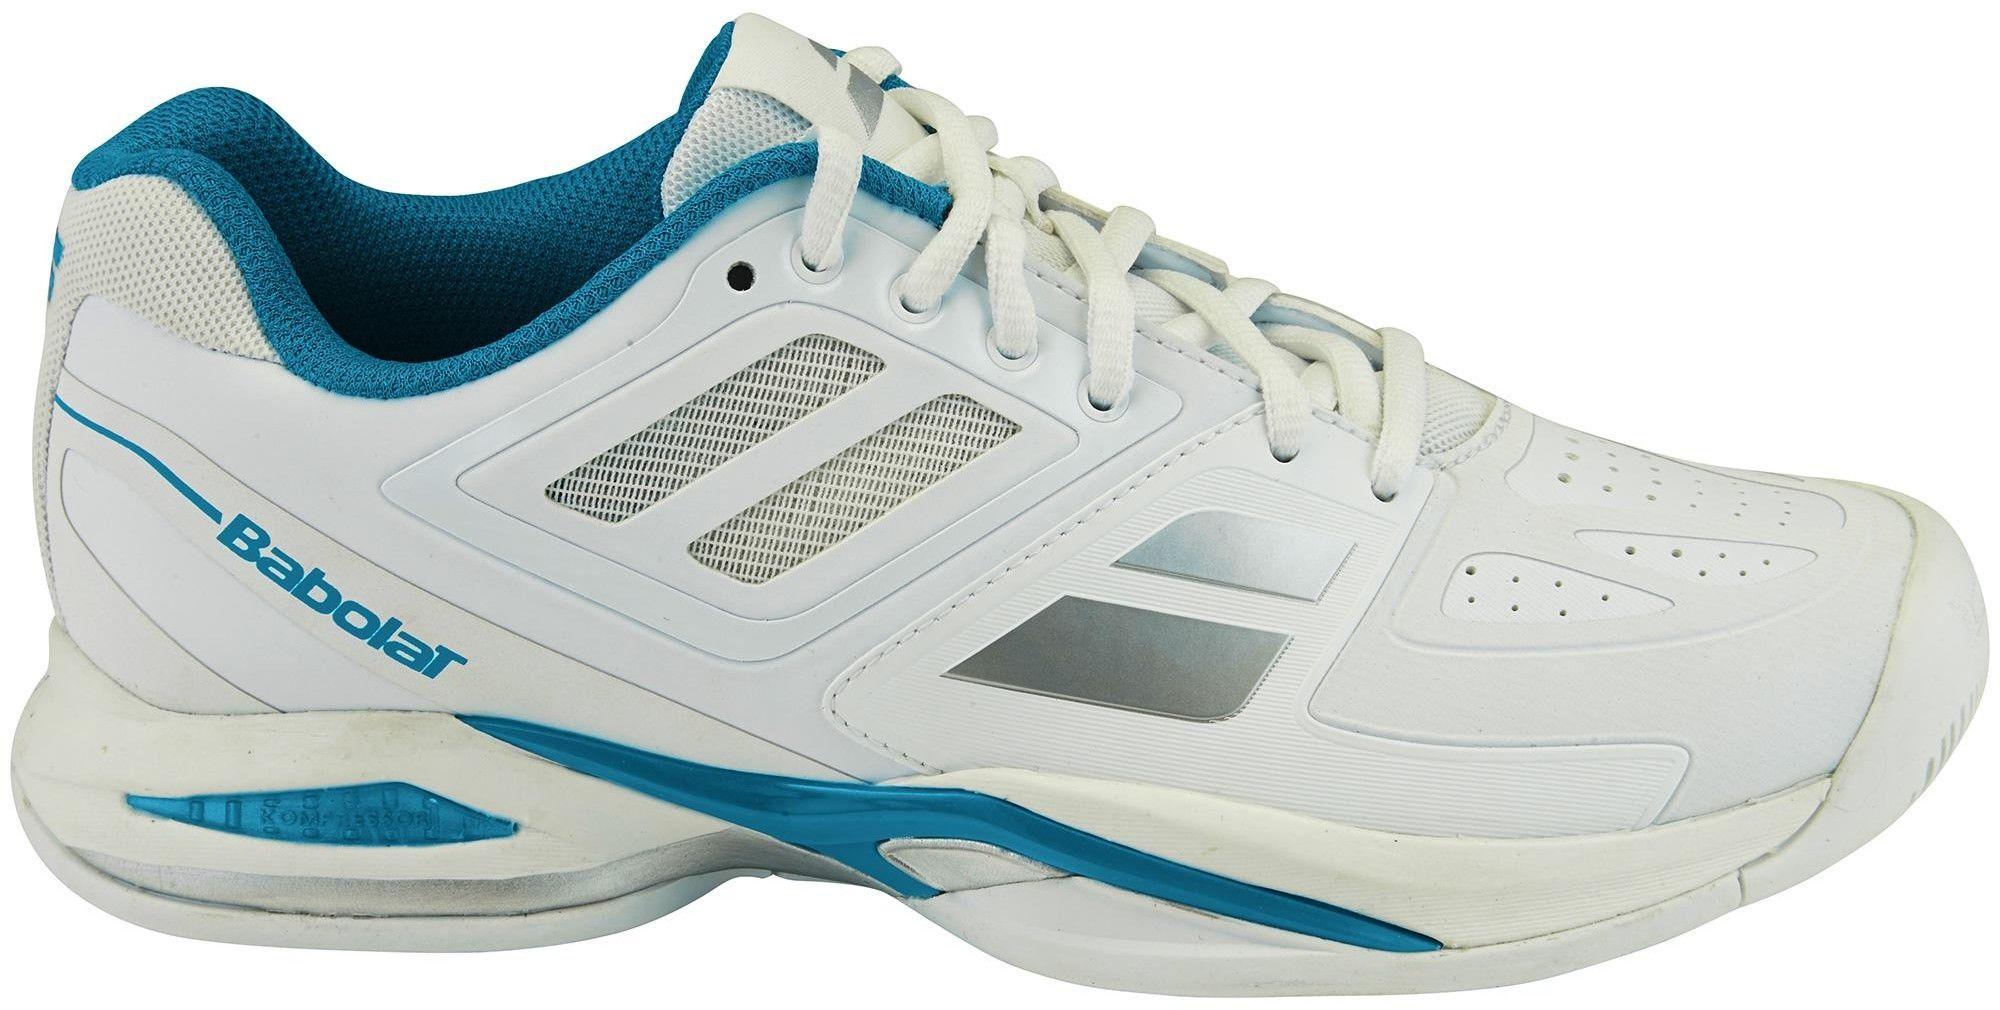 Babolat Propulse Team All Court W - white/blue